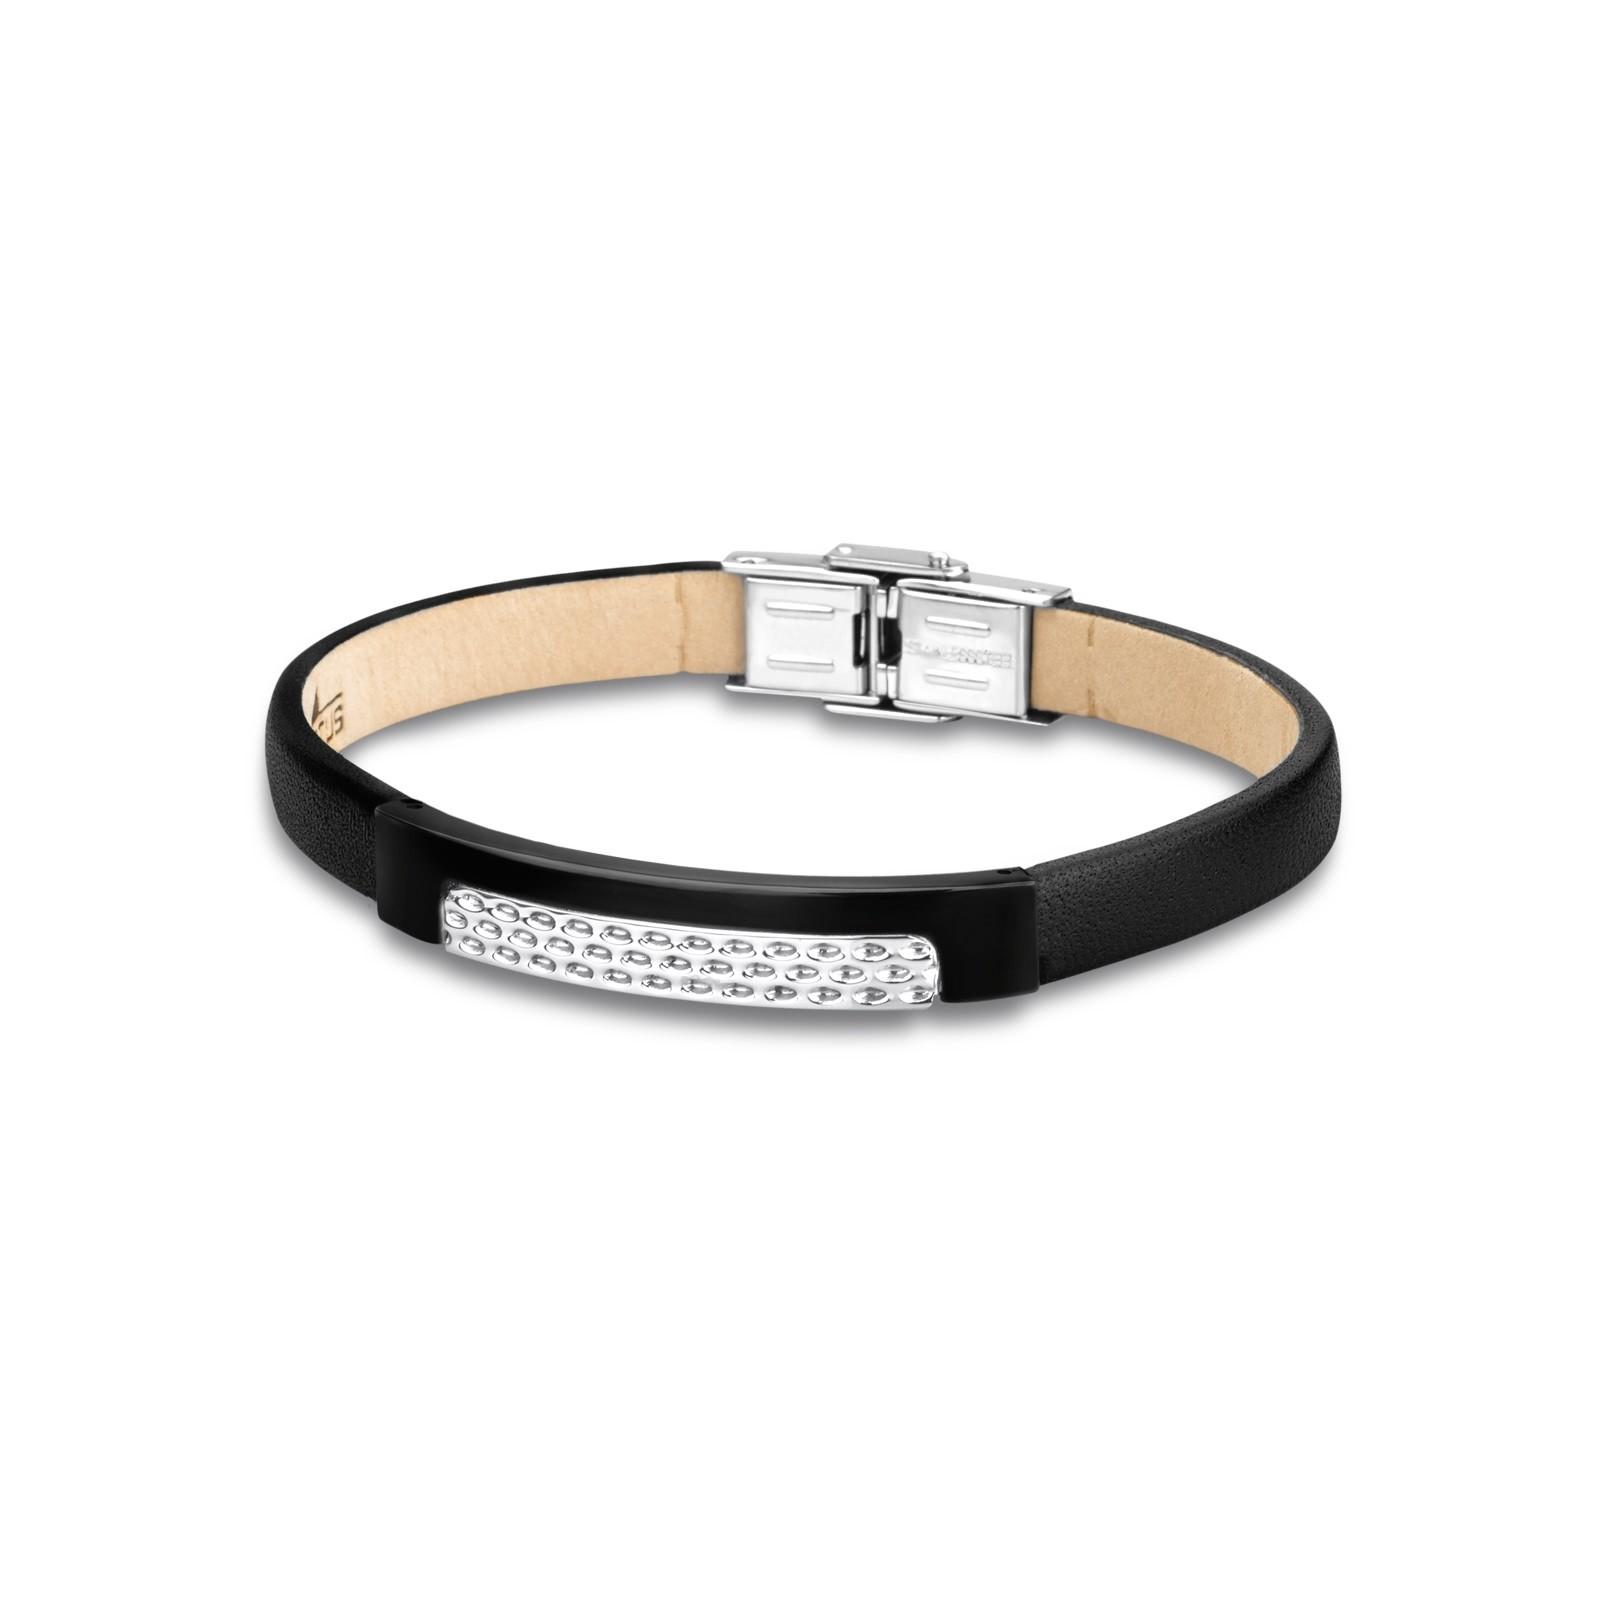 LOTUS Style Herren Armband Men in Black-Kollektion Edelstahl JLS1653-2-2